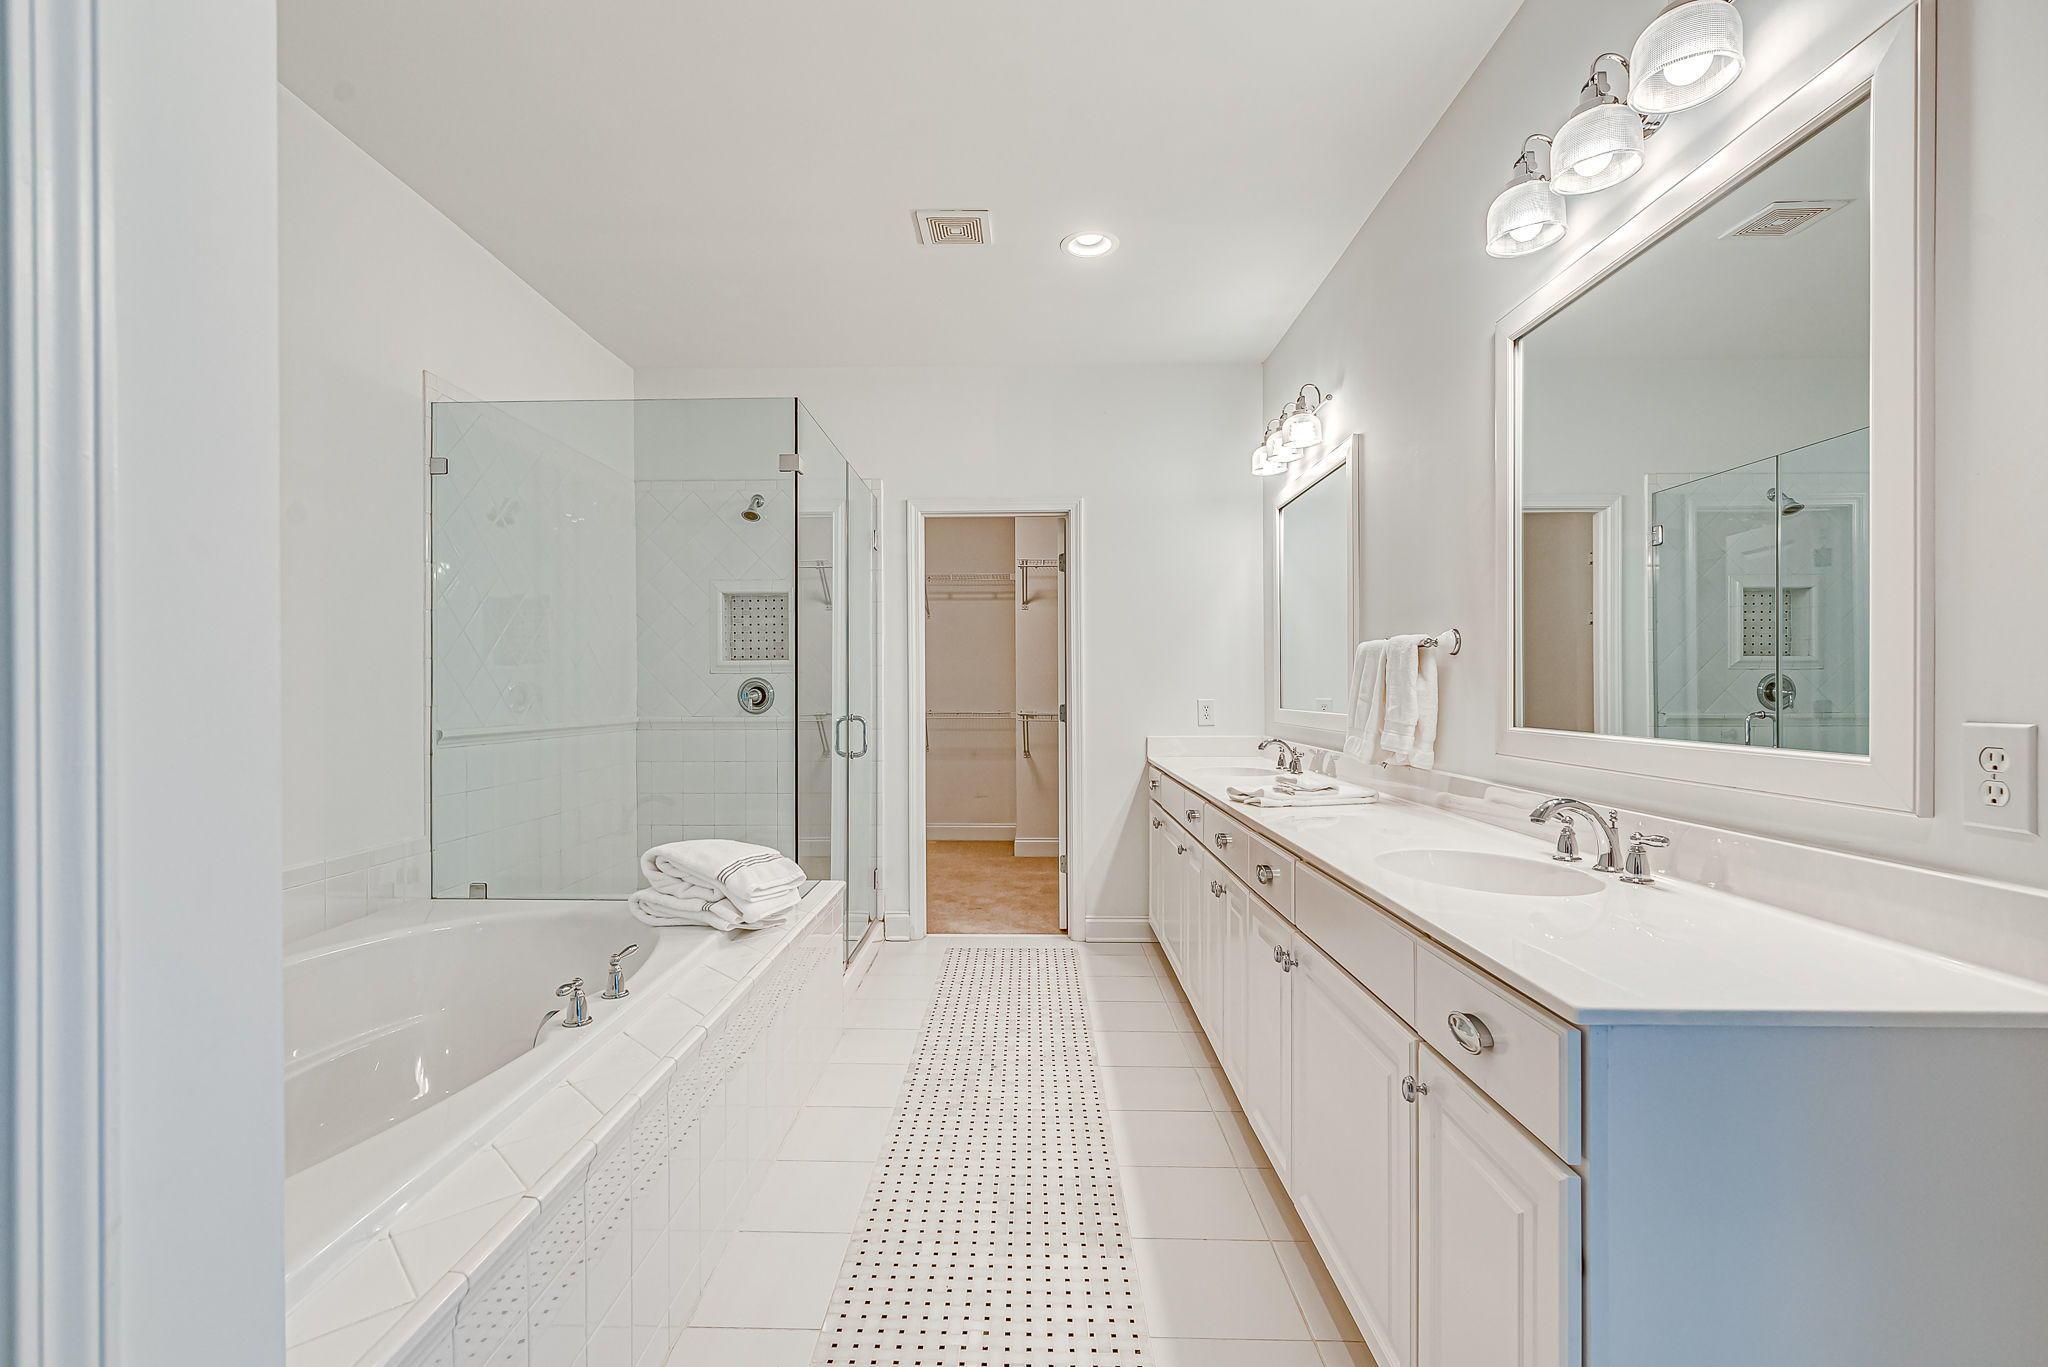 Dunes West Homes For Sale - 2476 Kings Gate, Mount Pleasant, SC - 5